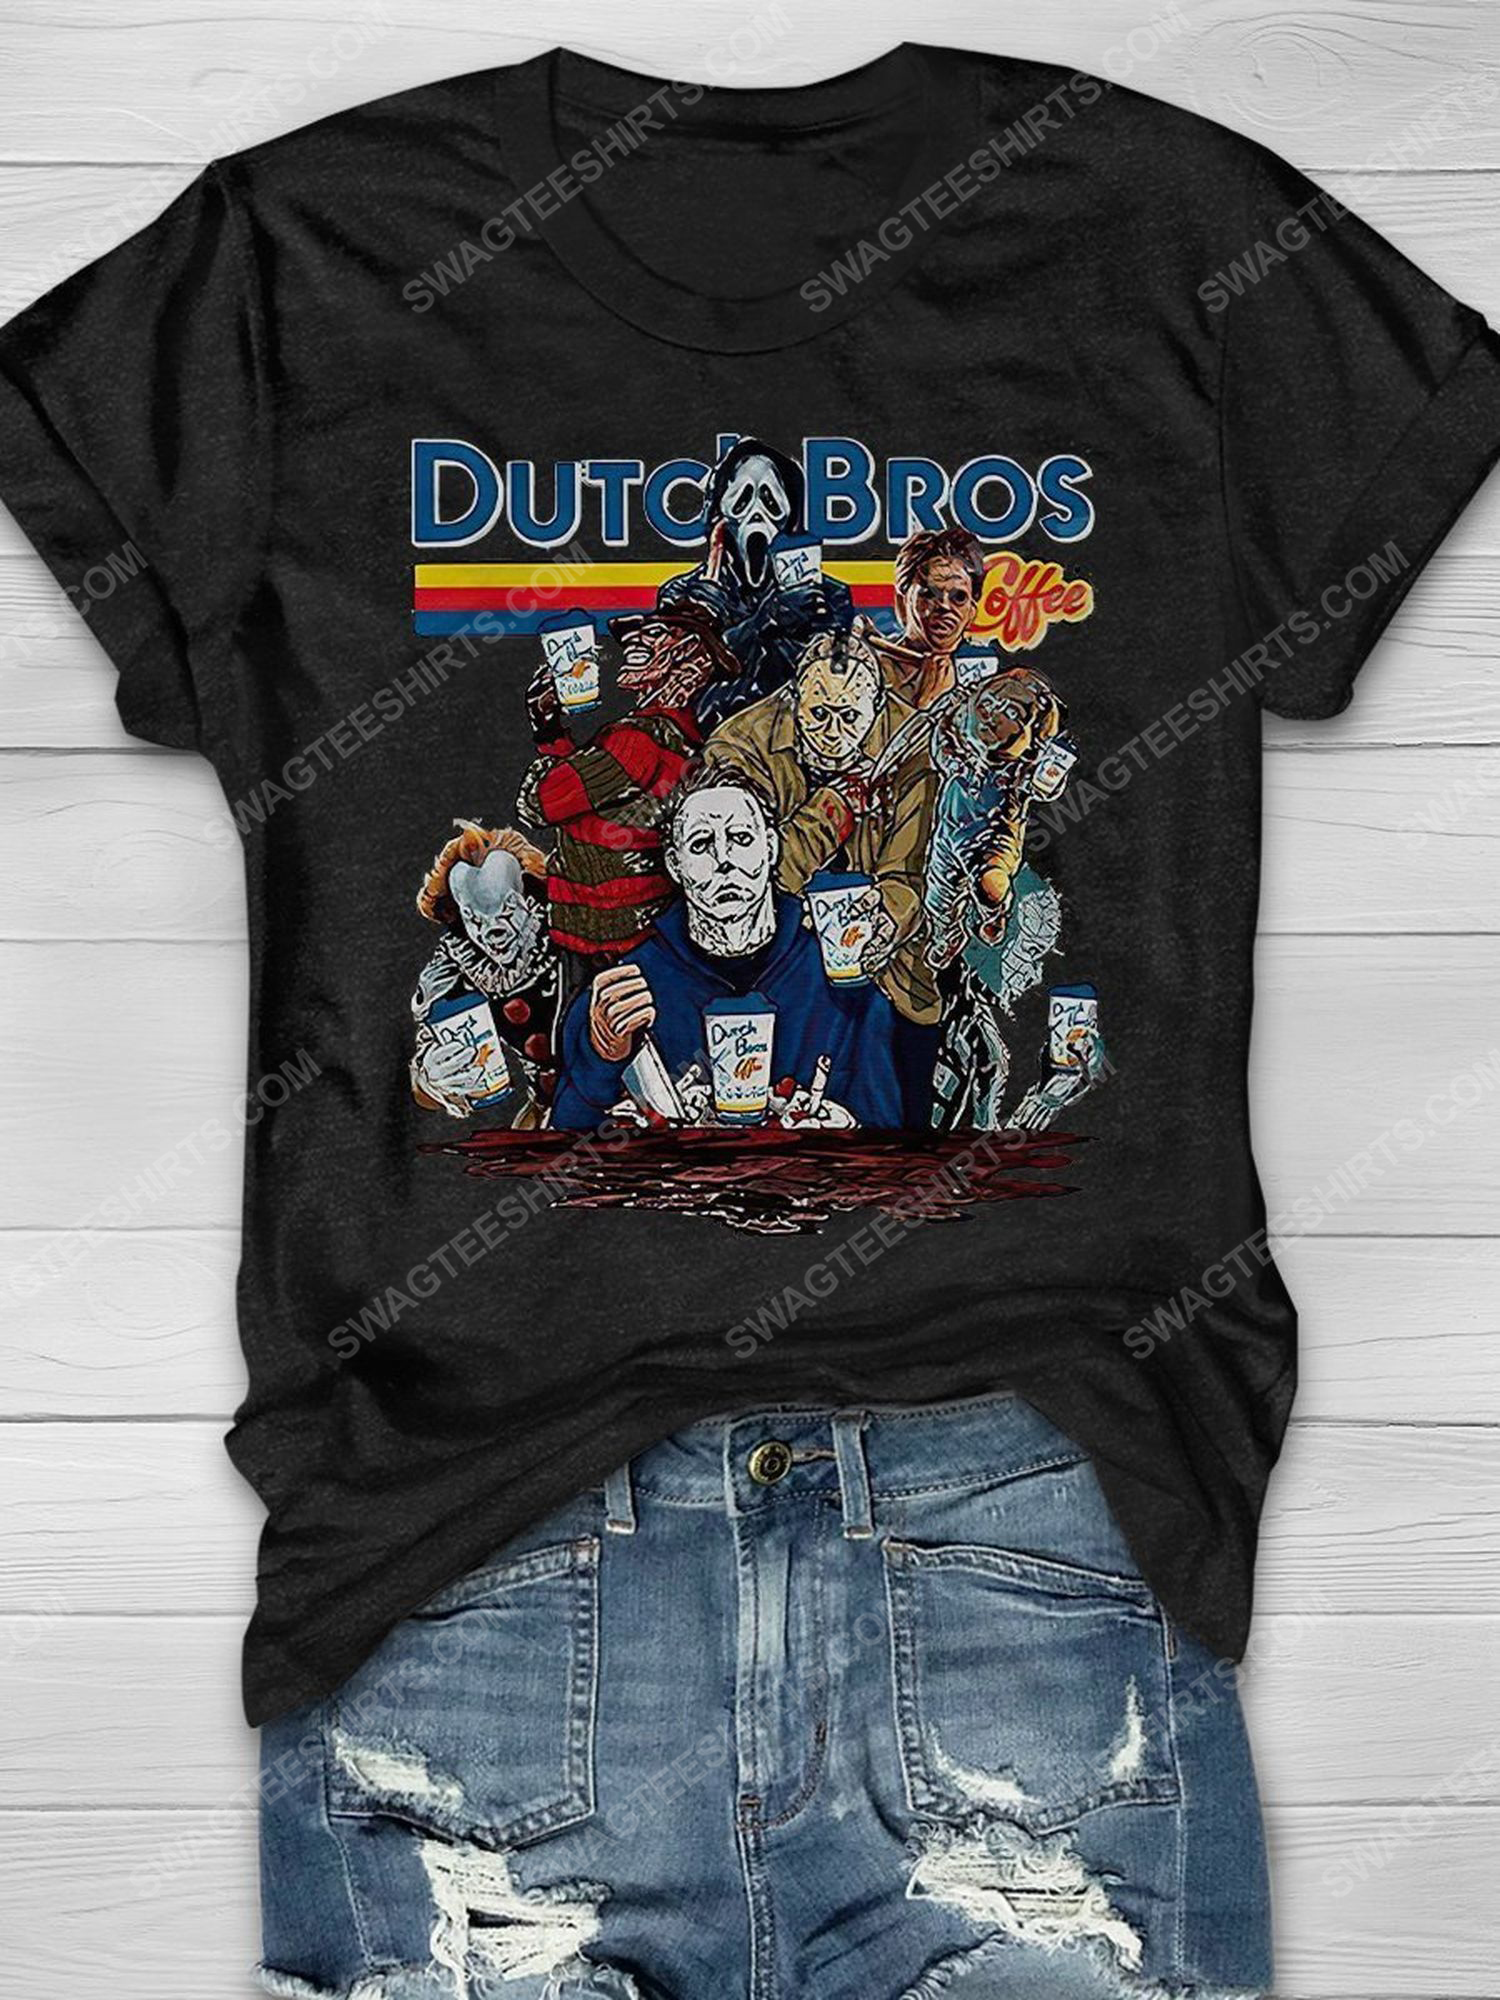 Halloween night dutch bros coffee serial killers shirt 1 - Copy (3)